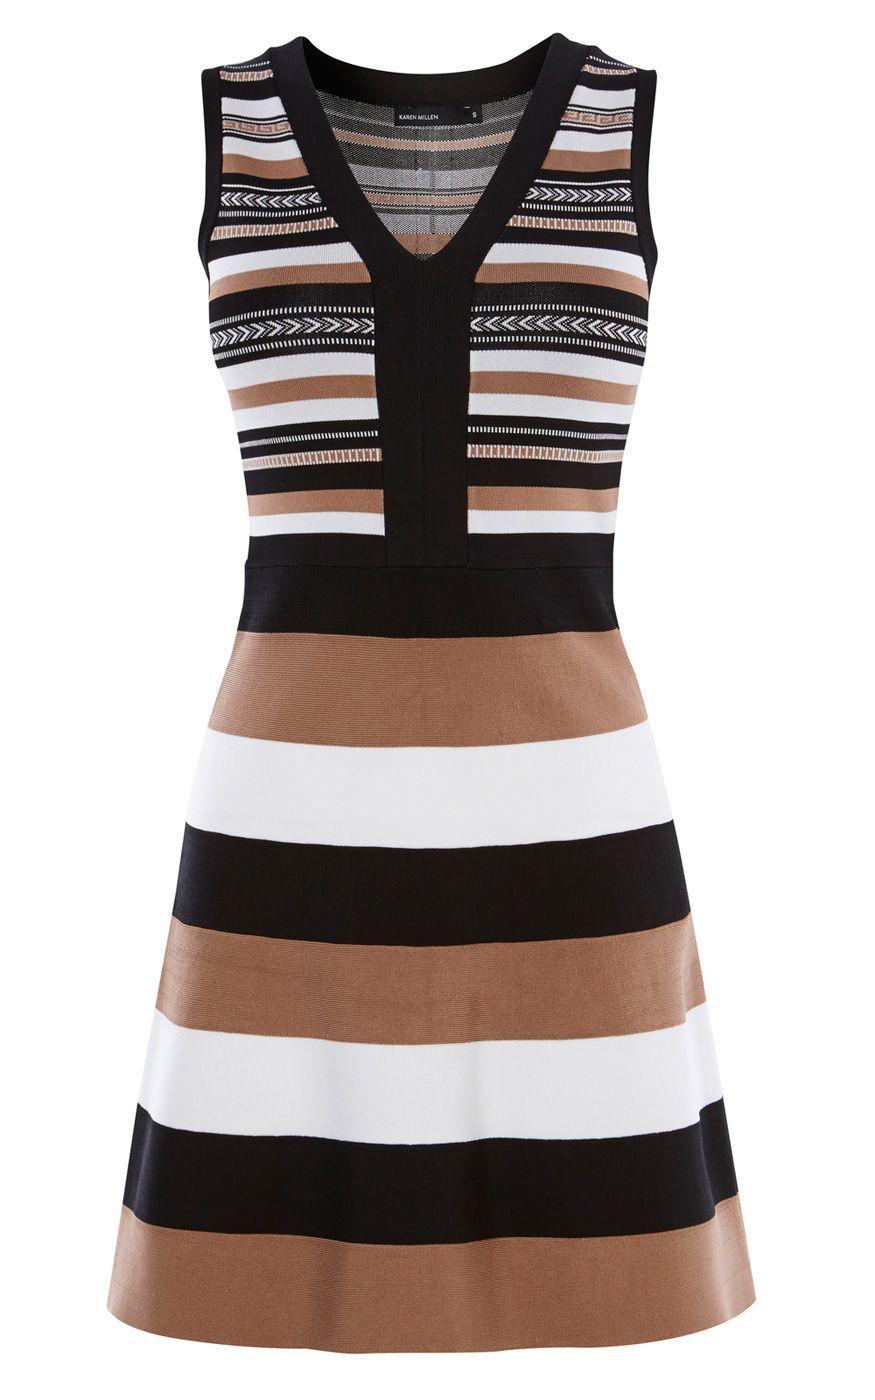 33e6ca3e3b Karen Millen | Brown Striped Bandage-knit Dress | Lyst | Outfits in ...